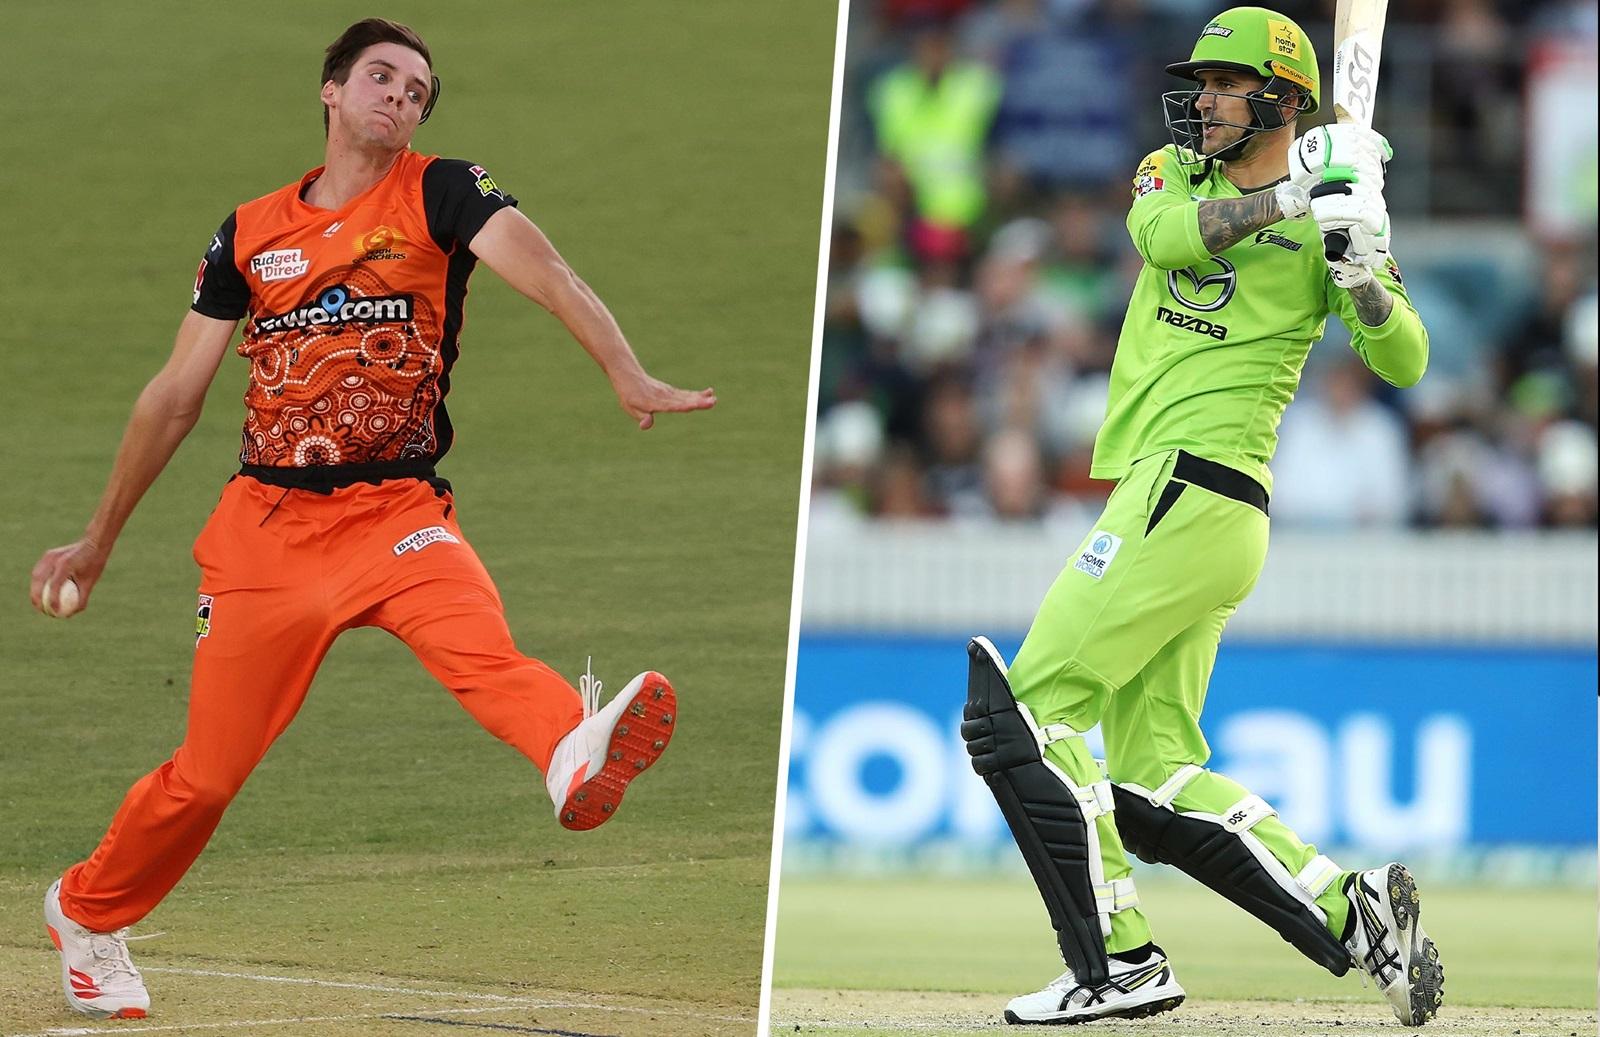 BBL stars tipped for big-money deals at IPL auction - cricket.com.au